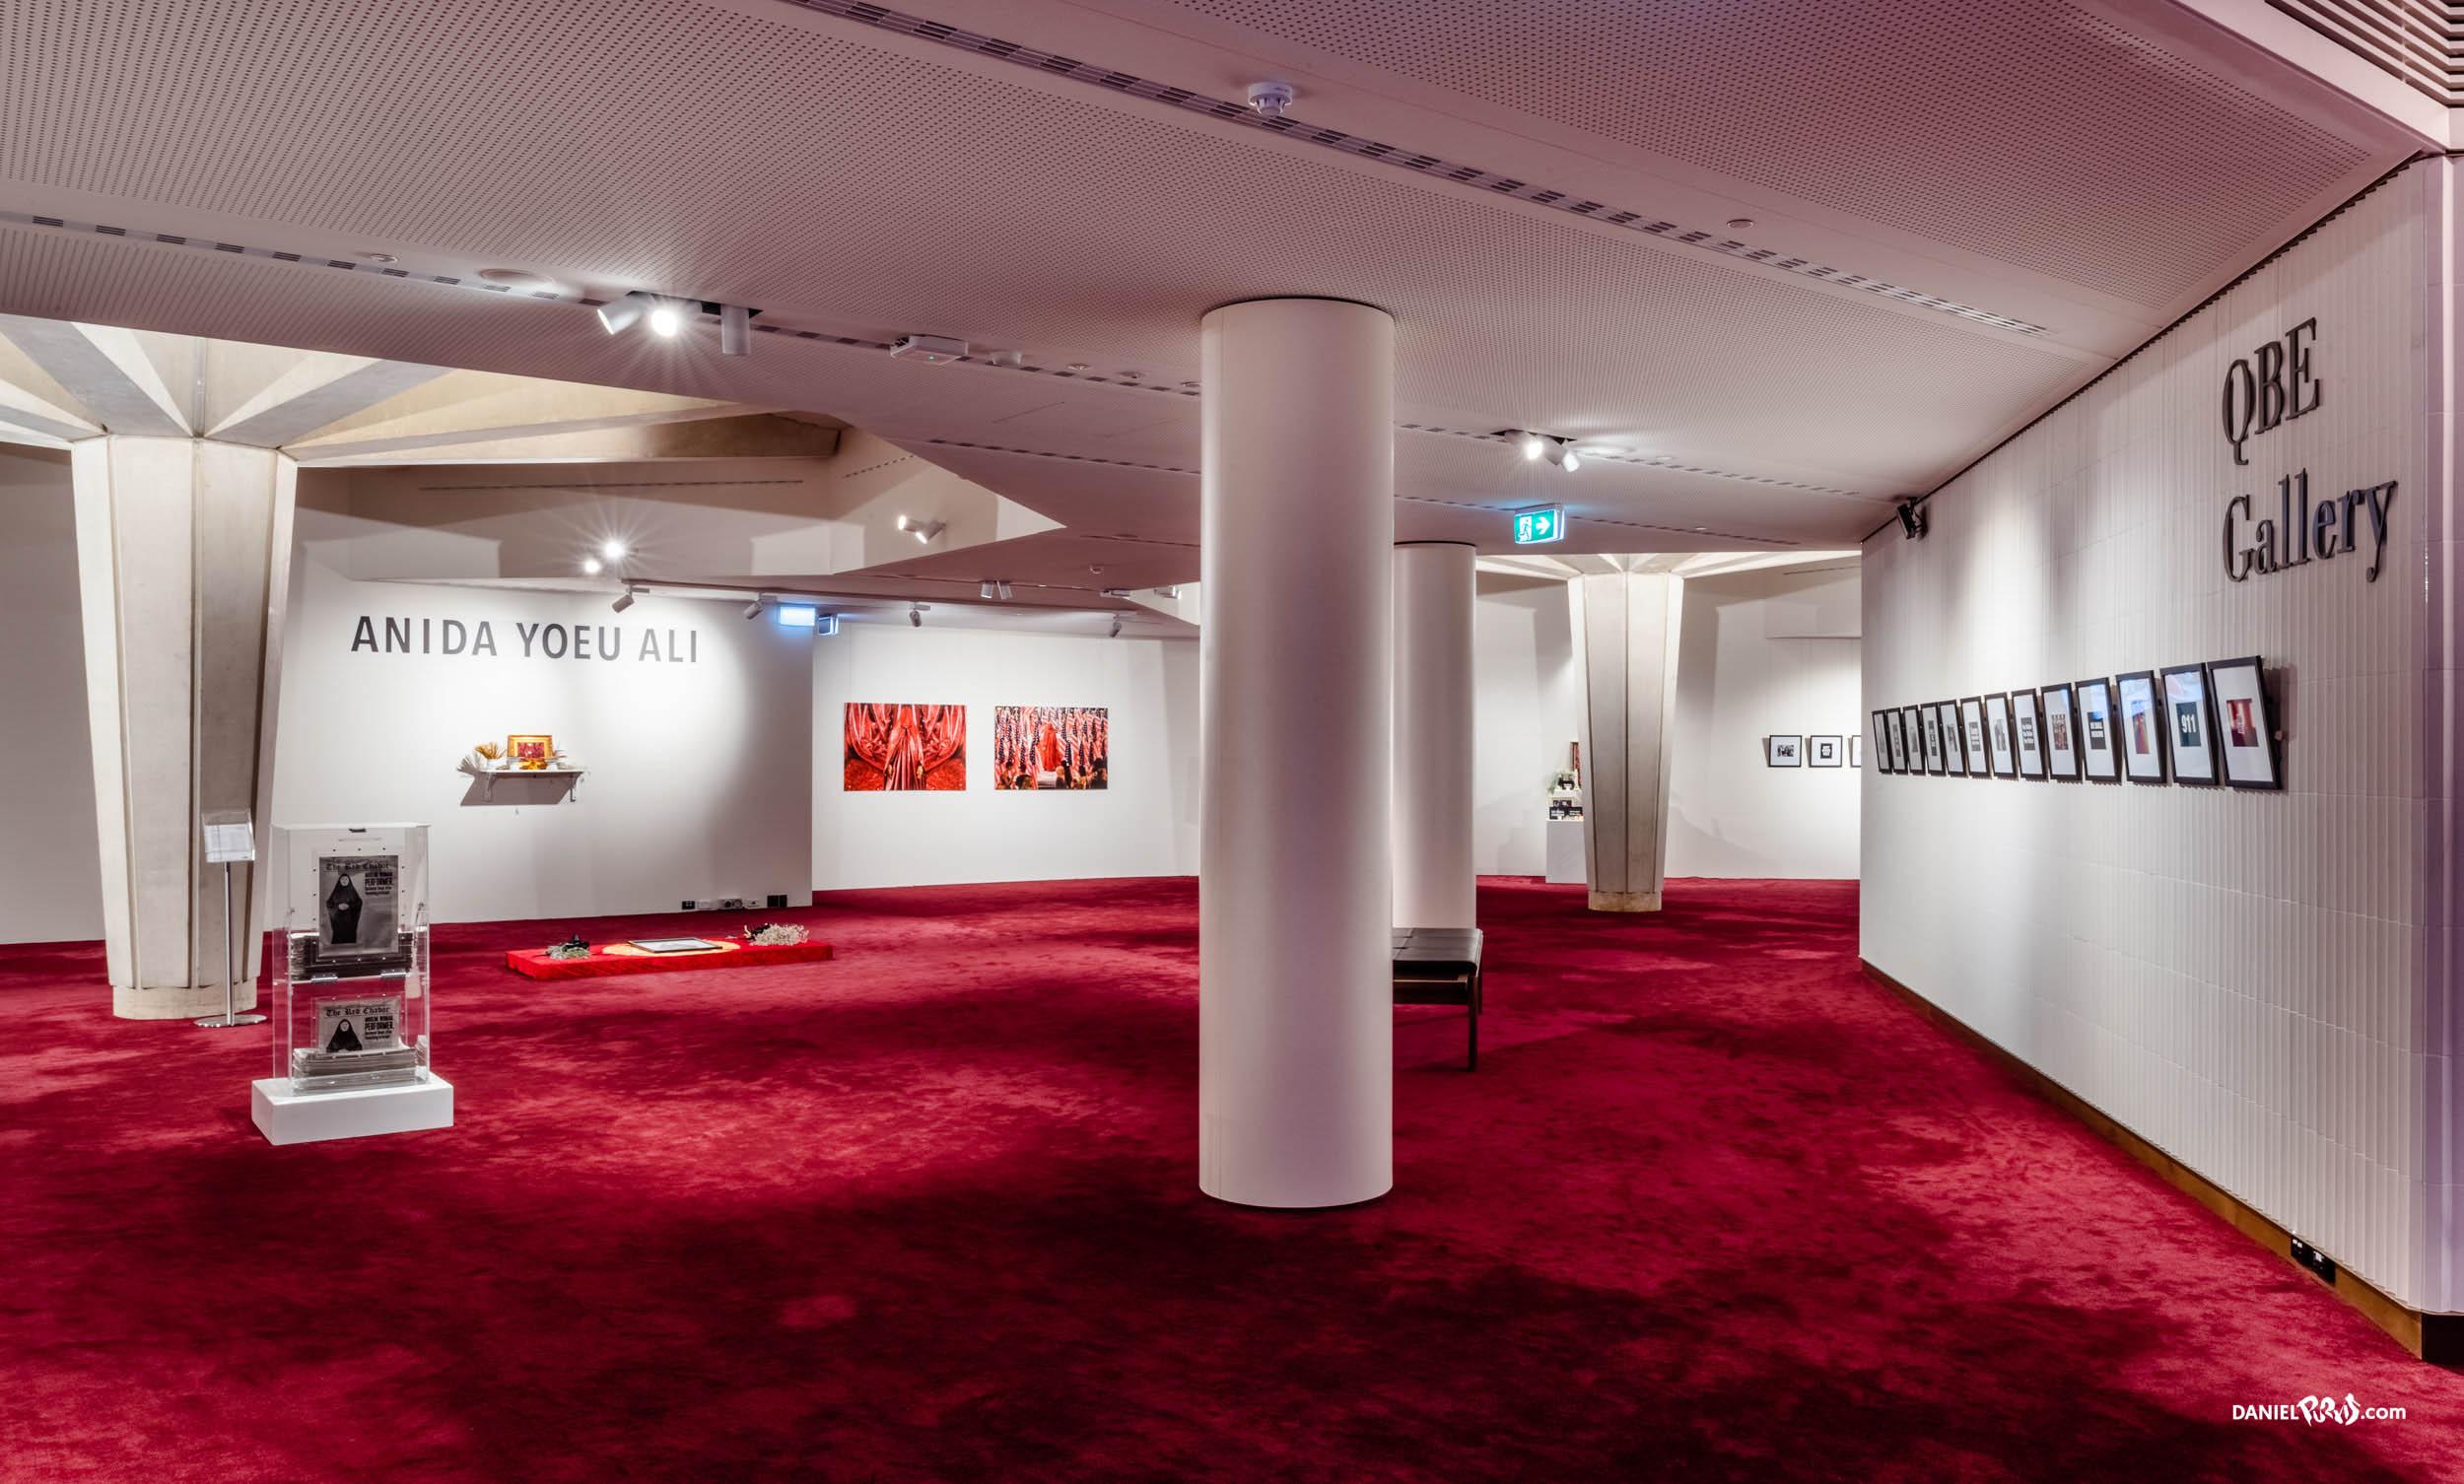 201812 OzAsia Exhibition - Anida Yoeu Ali - Daniel Purivs_DSC2663-HDR.jpg